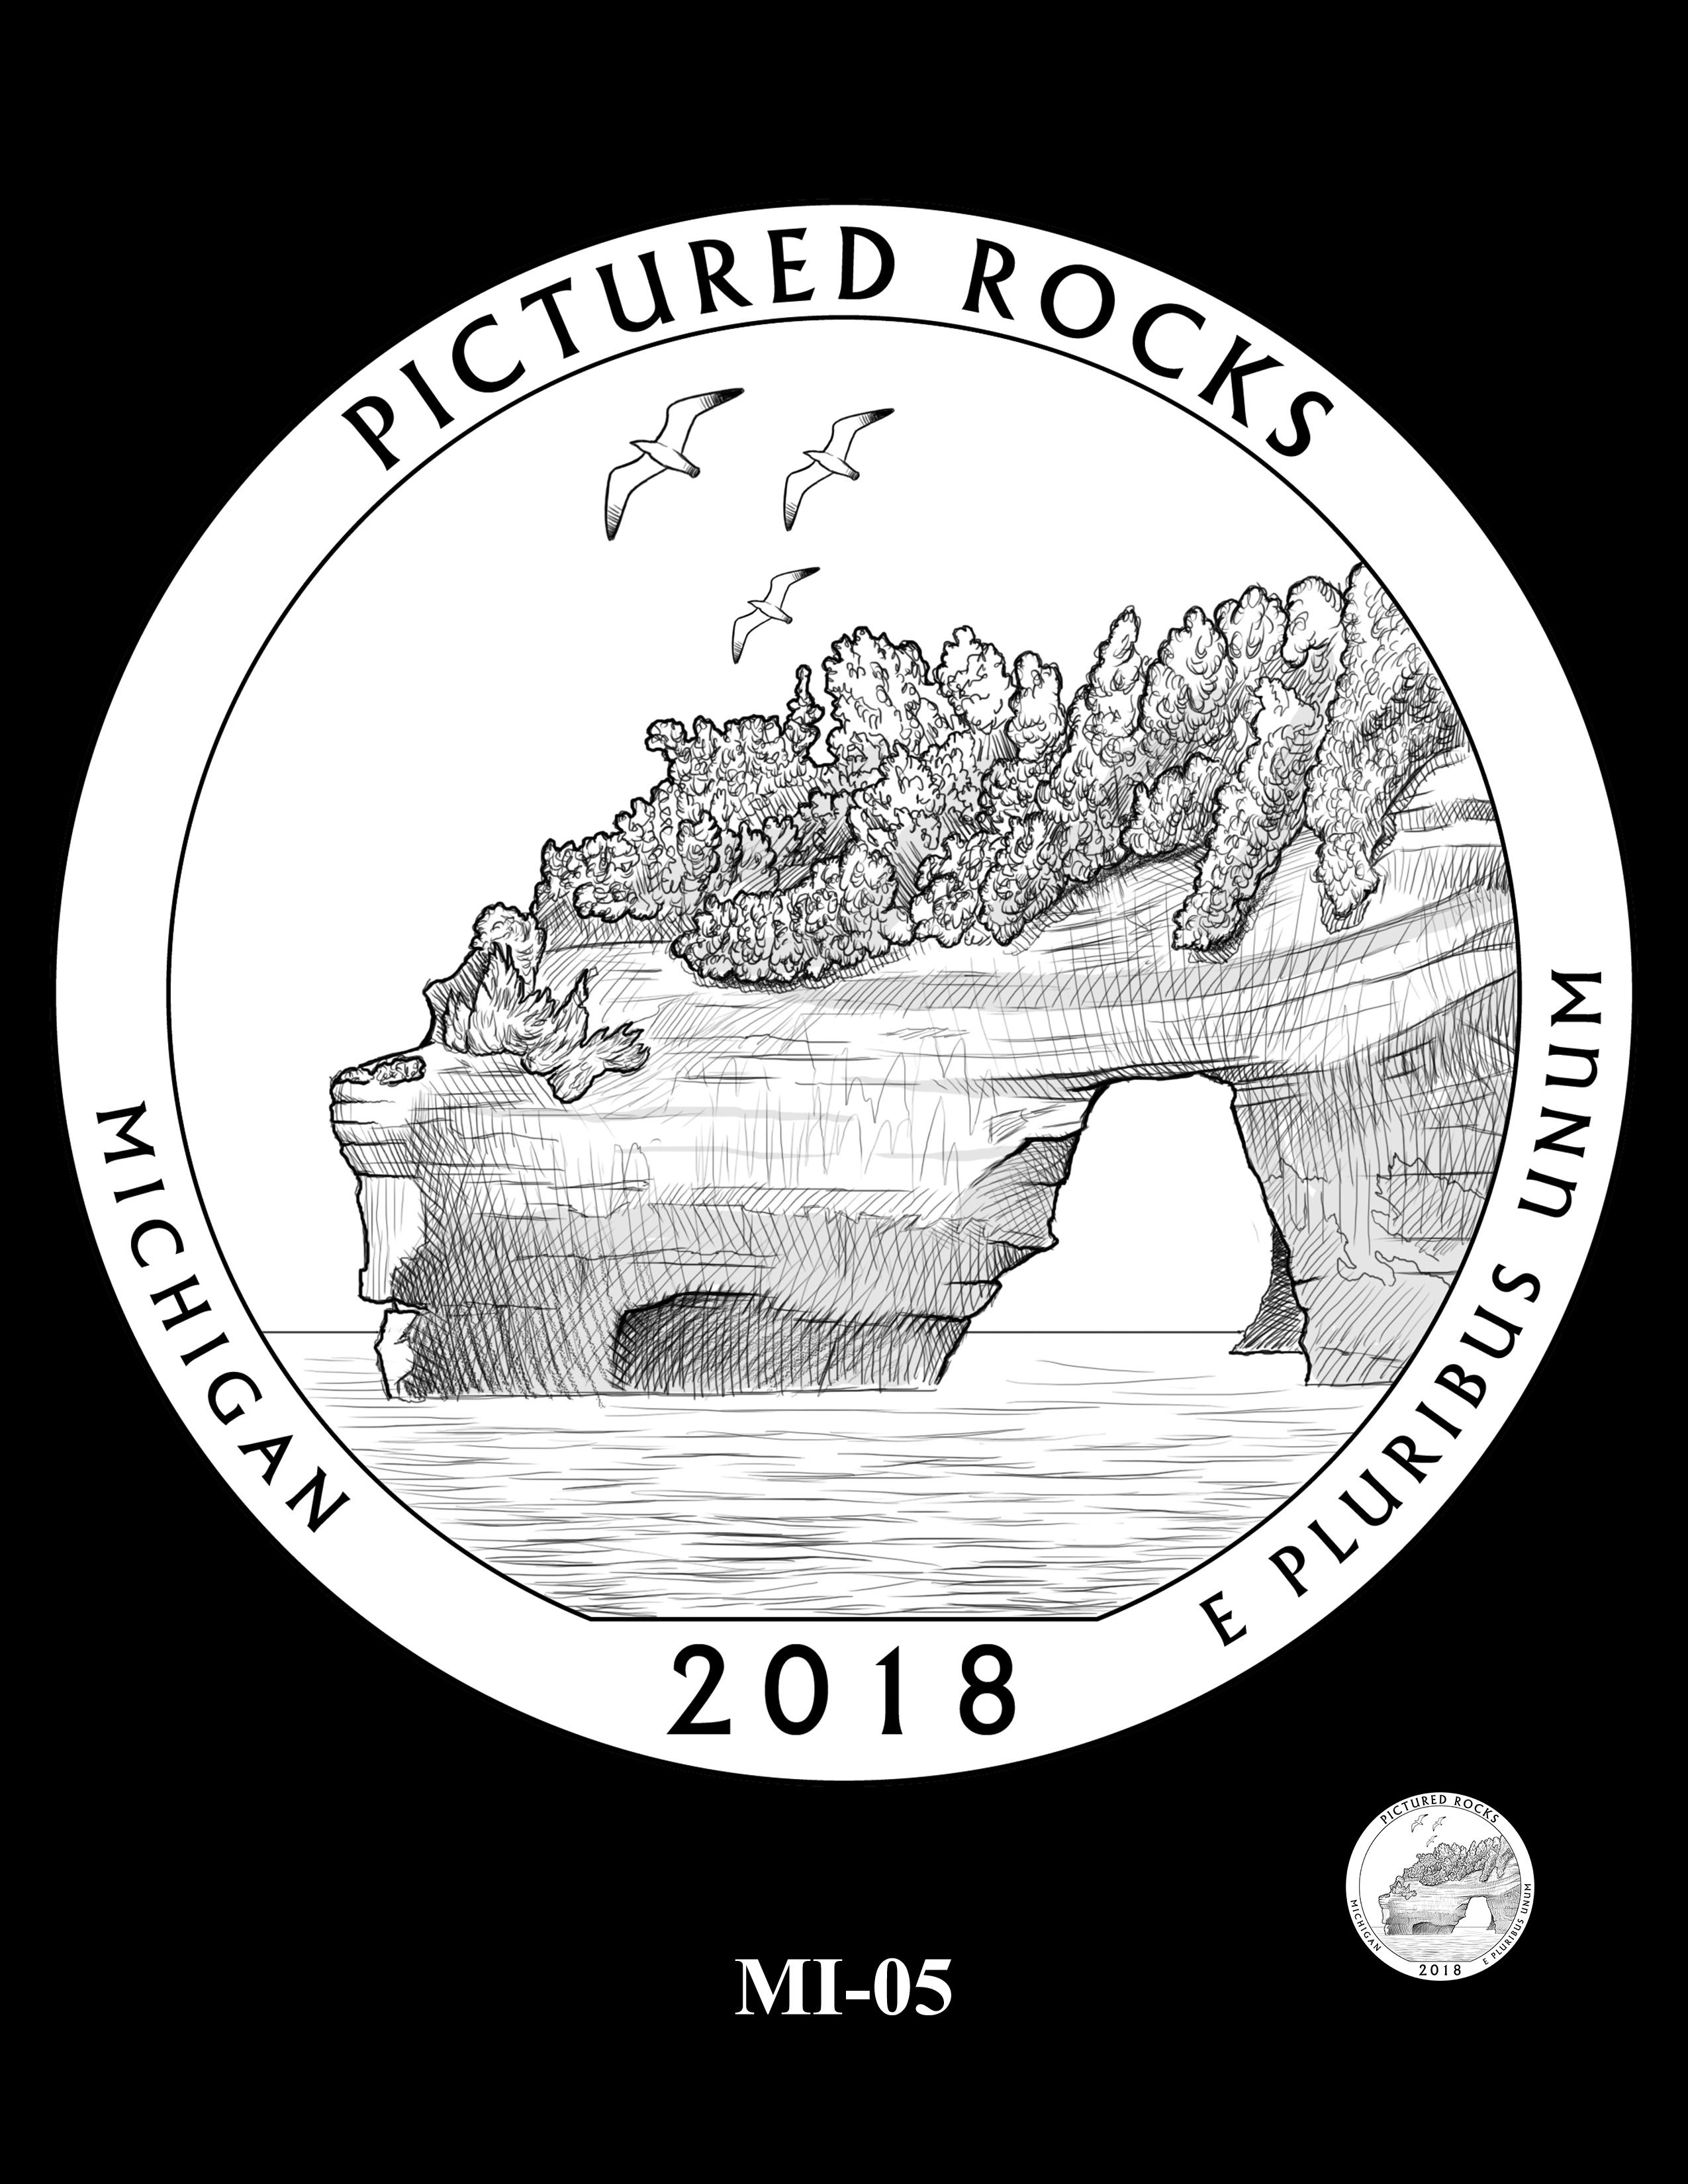 MI-05 -- 2018 America the Beautiful® Quarters Program